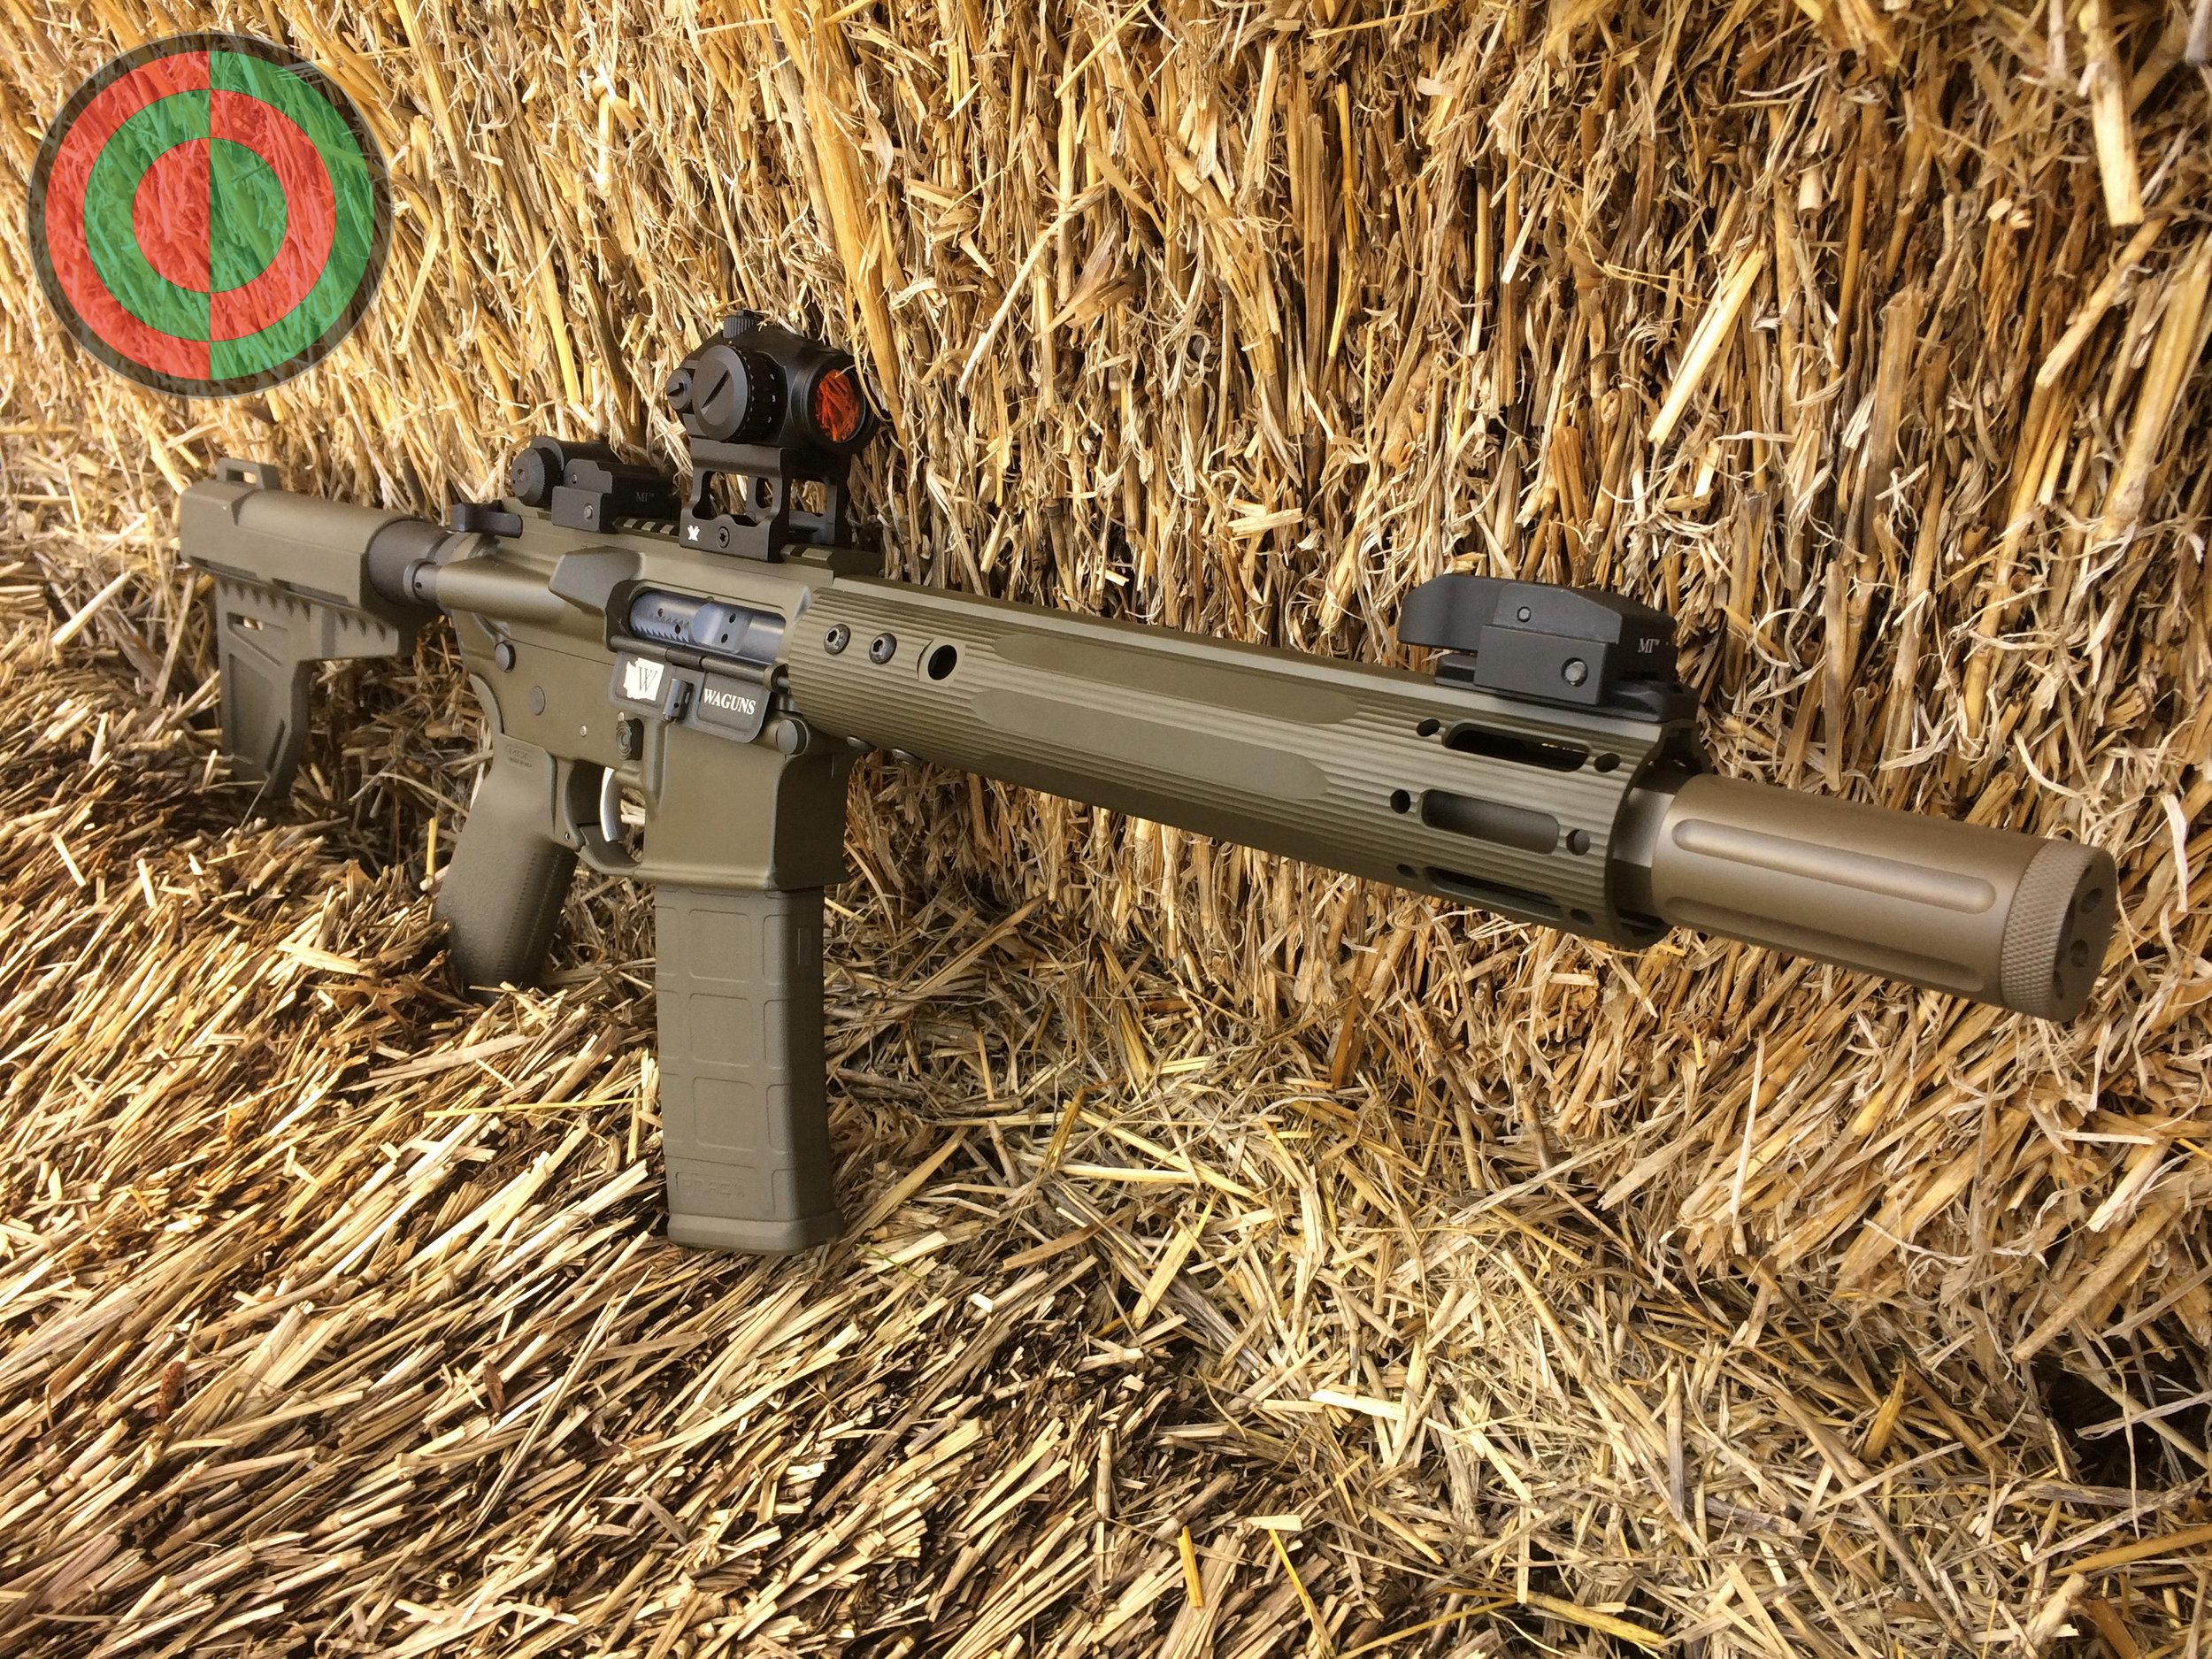 458 SOCOM pistol in Cerakote Magpul O.D. Green and Patriot Brown.